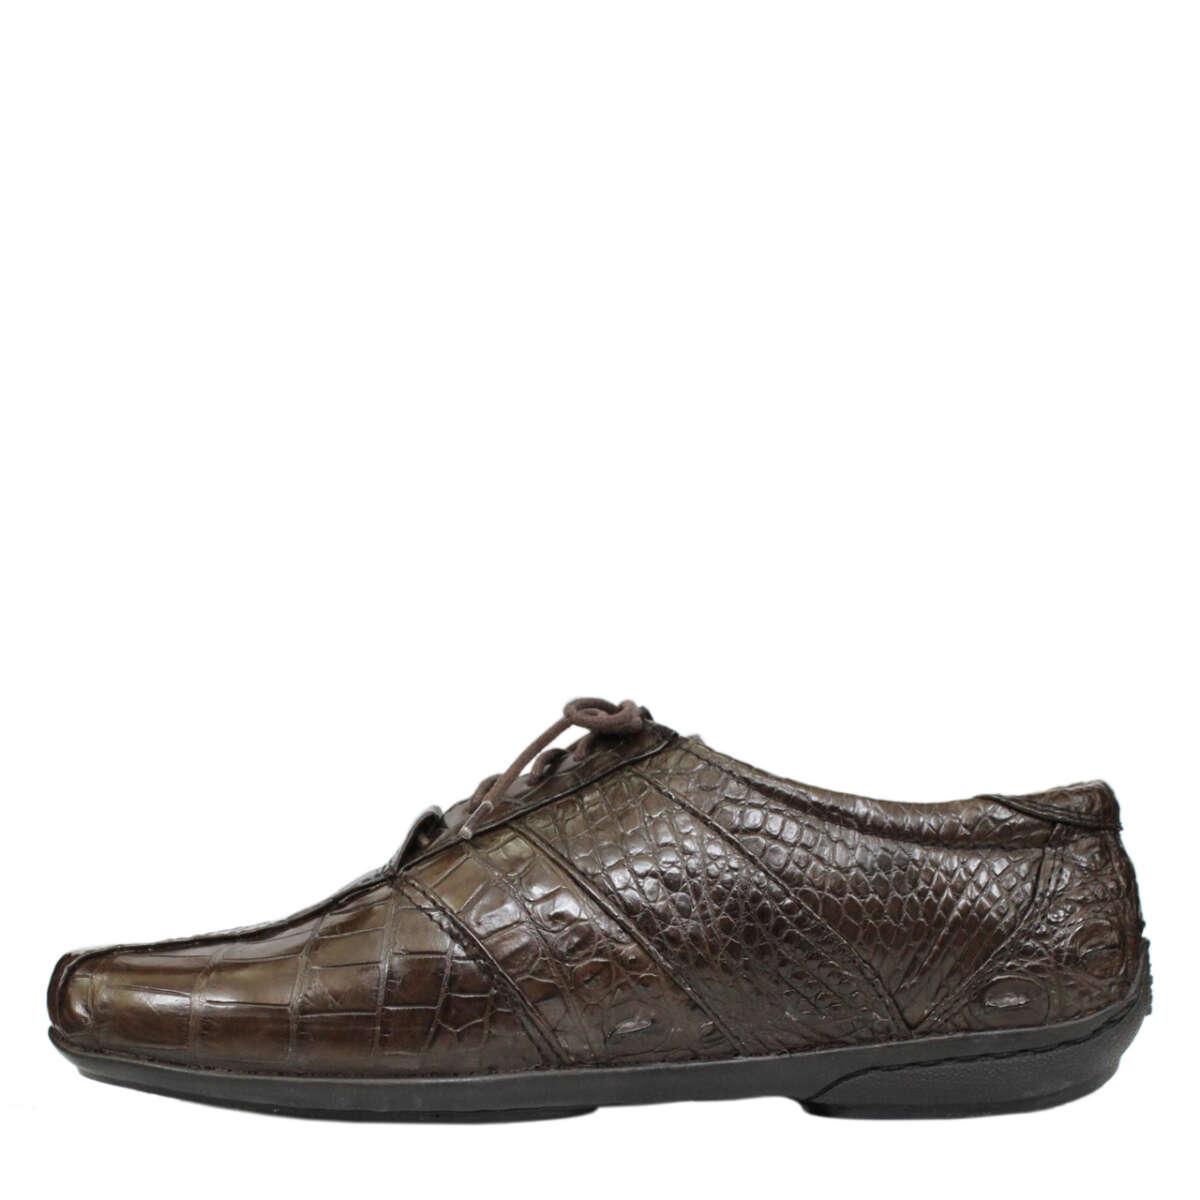 Giày nam da cá sấu S867a